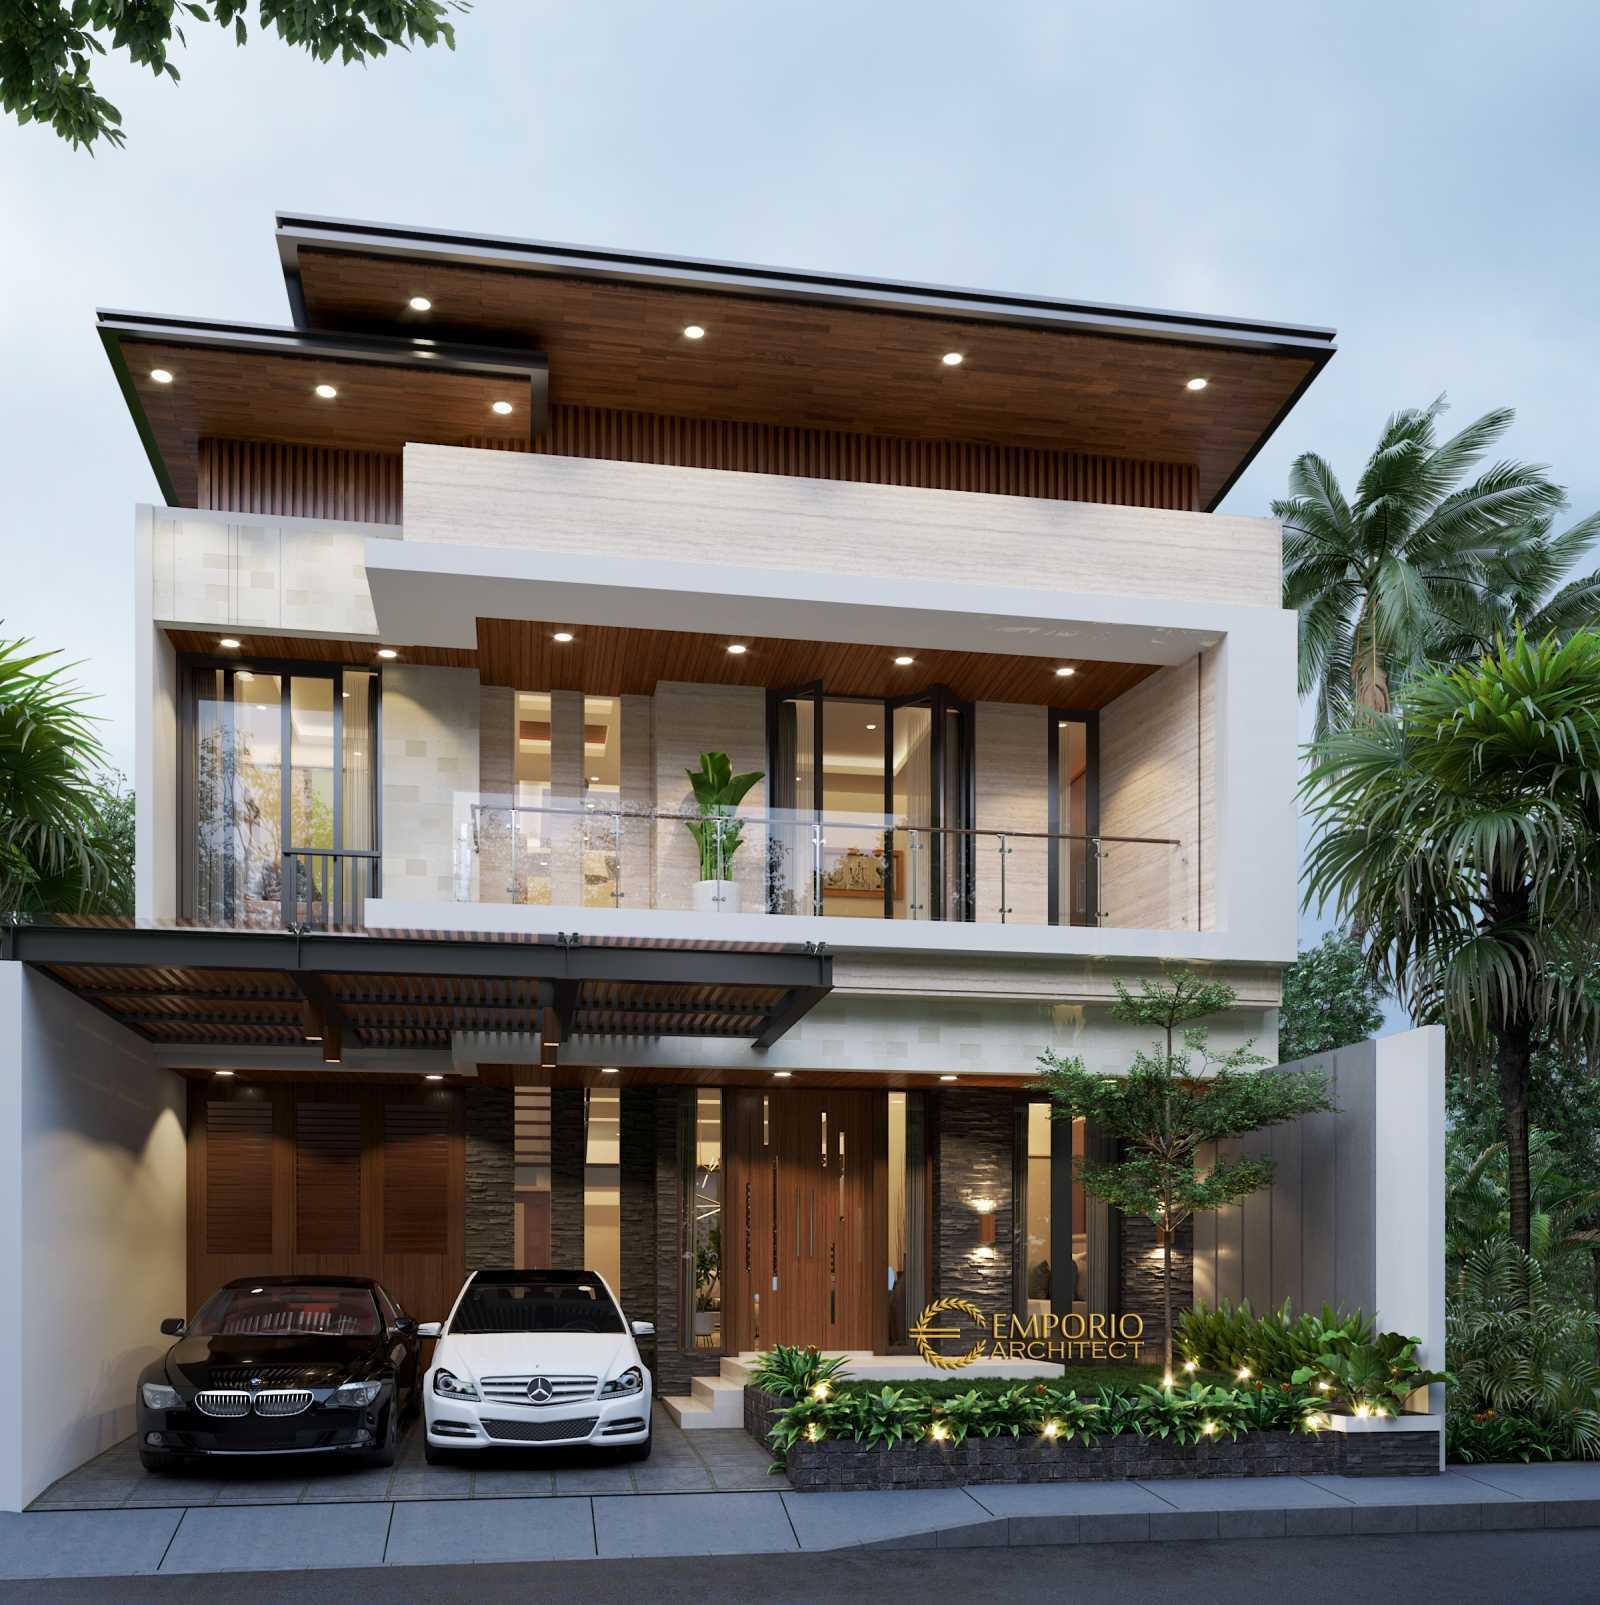 Emporio Architect Jasa Arsitek Jakarta Timur Desain Rumah Modern Tropis 625 @ Jakarta Timur Jakarta Timur, Kota Jakarta Timur, Daerah Khusus Ibukota Jakarta, Indonesia Jakarta Timur, Kota Jakarta Timur, Daerah Khusus Ibukota Jakarta, Indonesia Emporio-Architect-Jasa-Arsitek-Jakarta-Timur-Desain-Rumah-Modern-Tropis-625-Jakarta-Timur Modern  82957